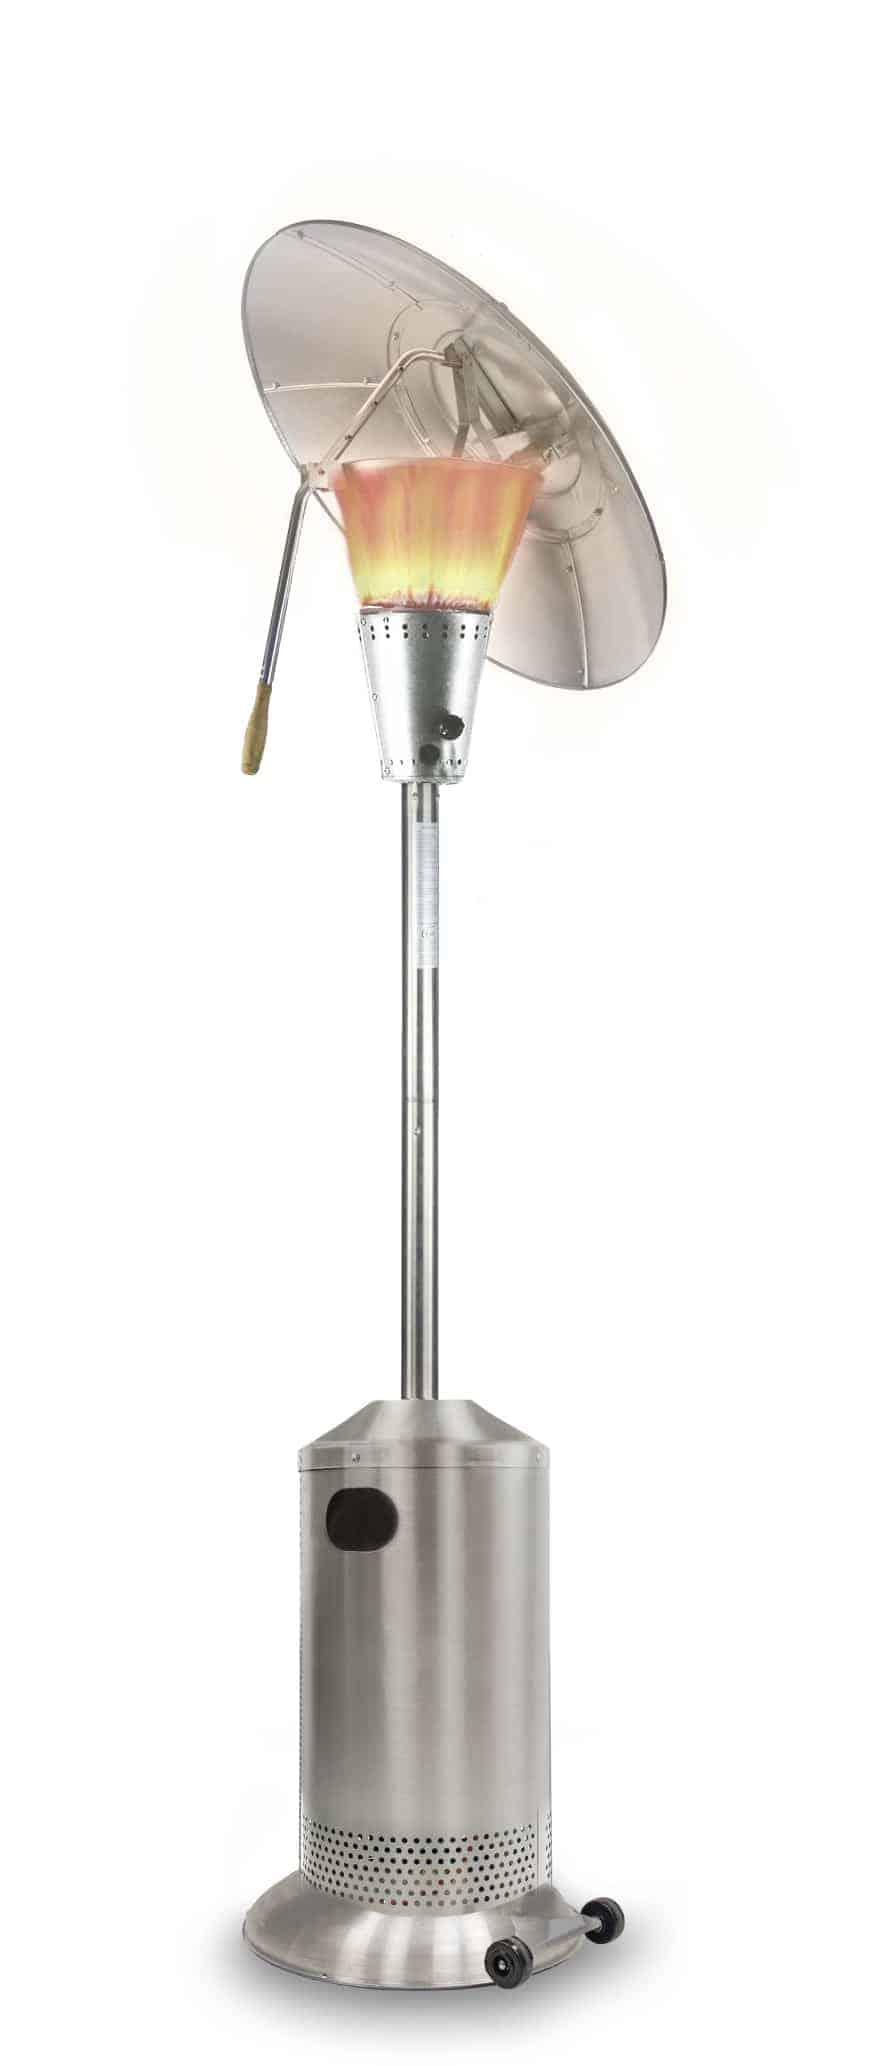 tilt heater heat stainless patio silver steel product gas hood focus high res lightbox